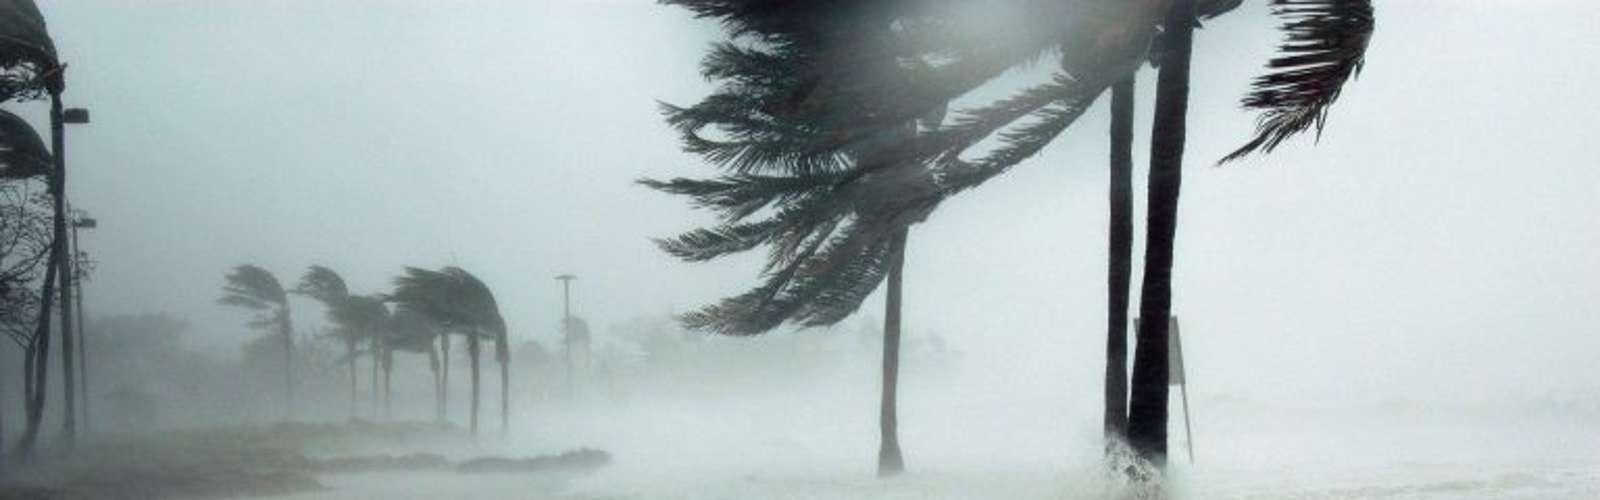 VoIP Communication Through Hurricane Season